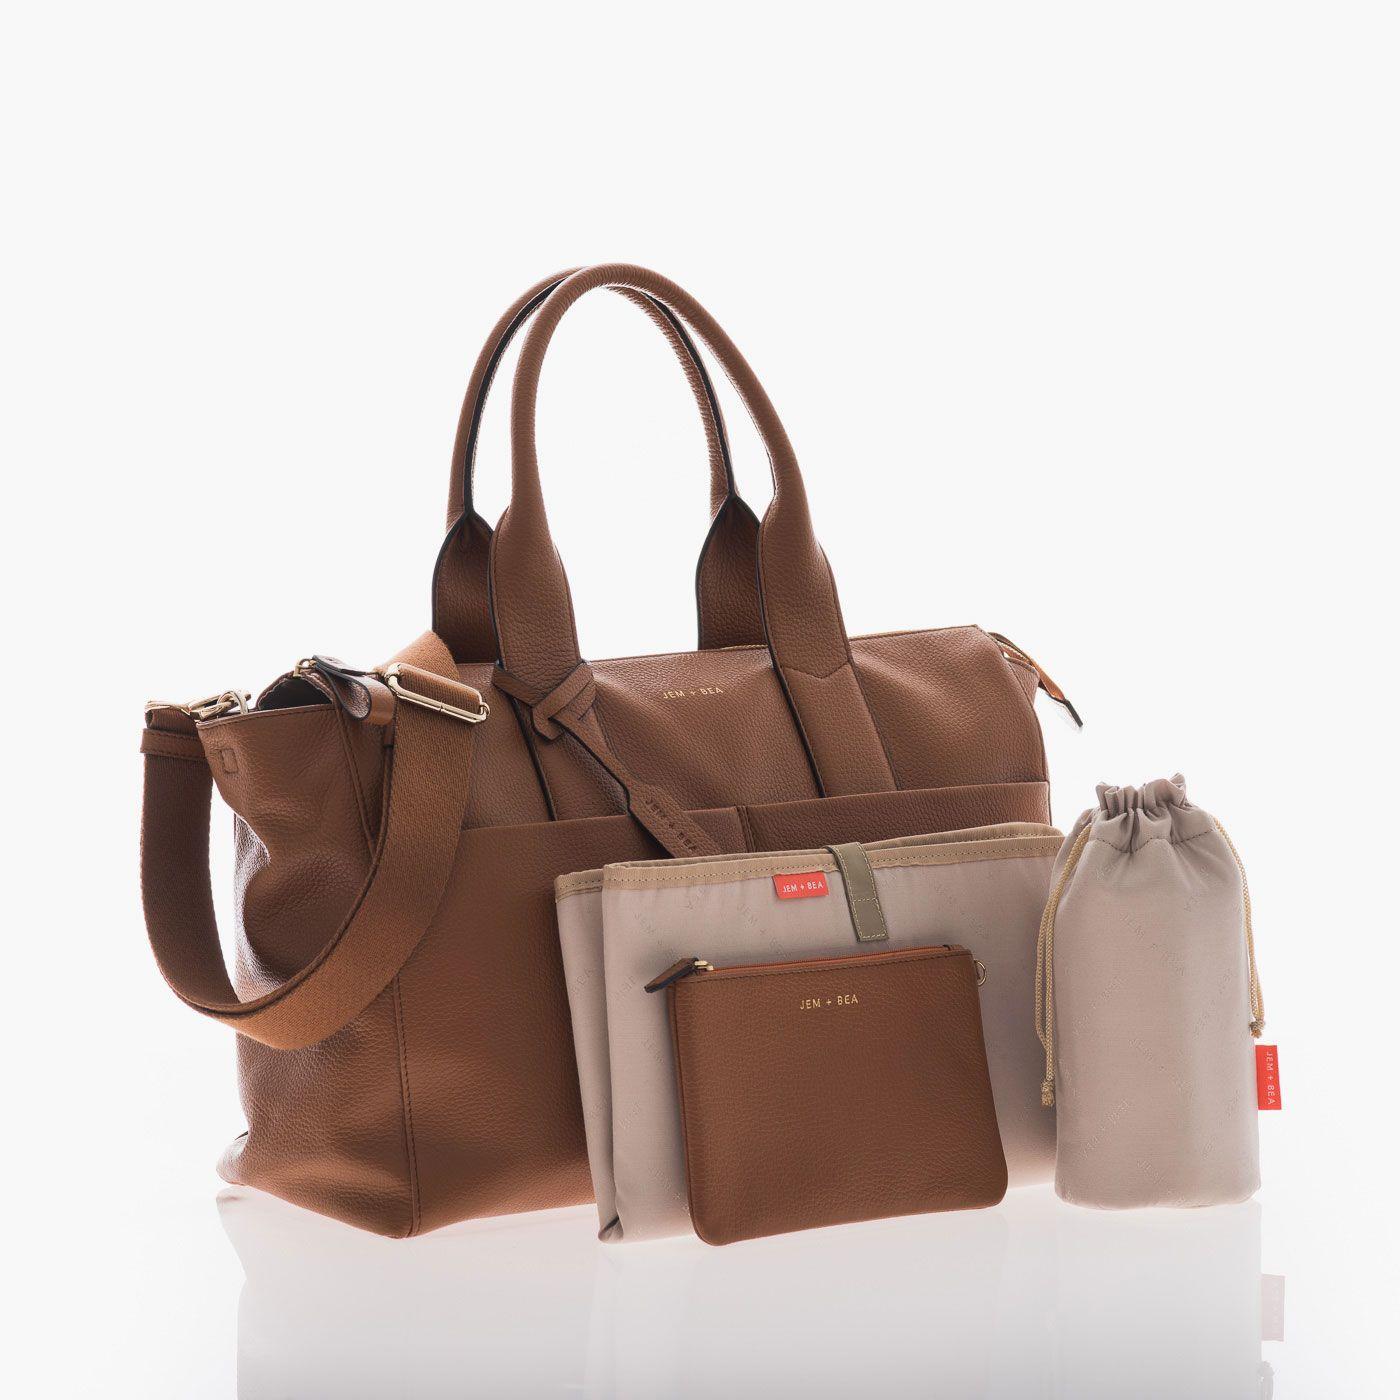 Jemima Tan Jem Bea Luxury Baby Changing Bags